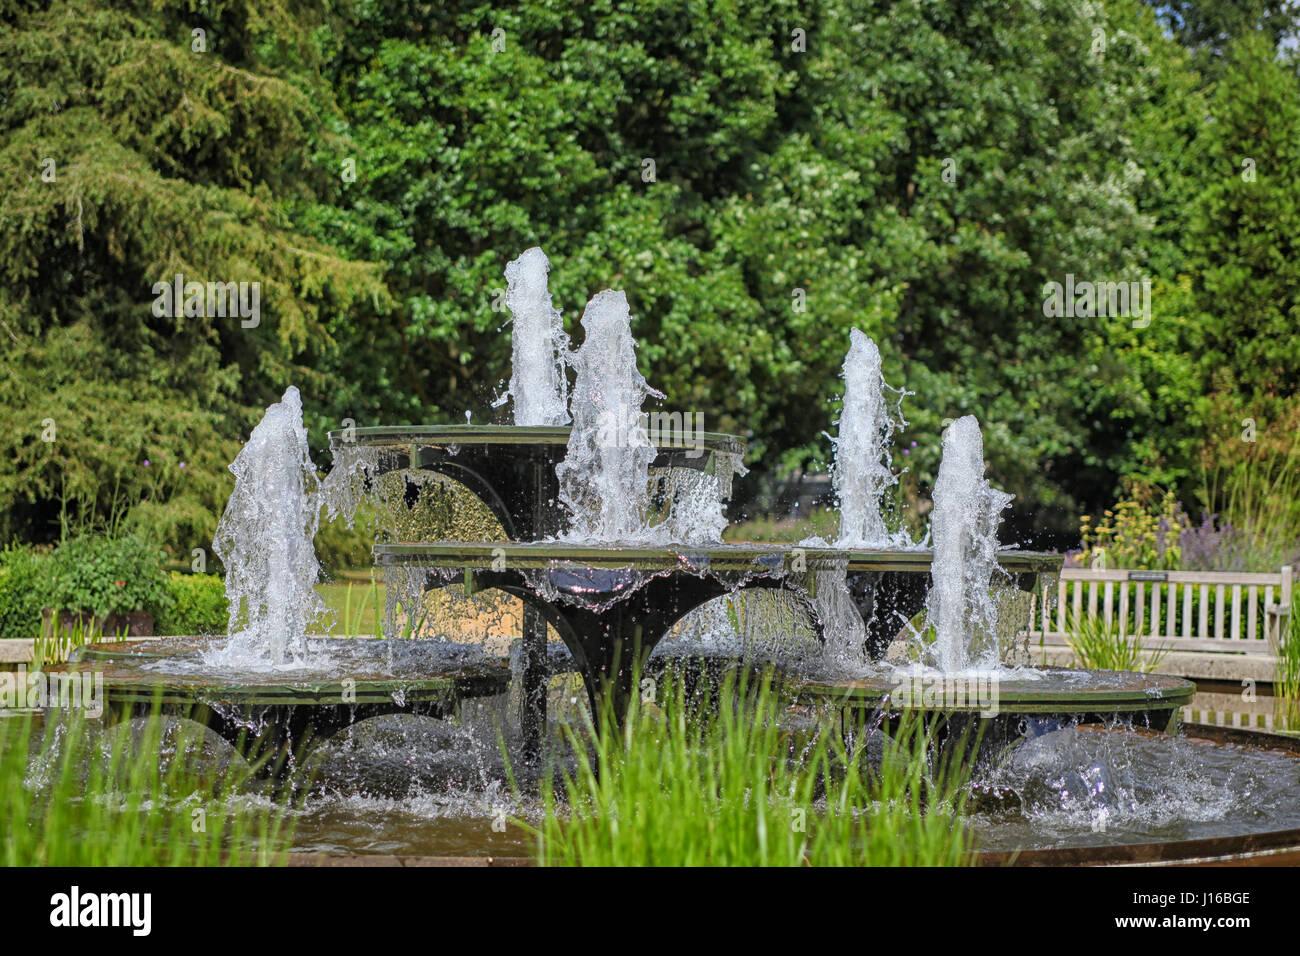 Fontana Giardino Pietra : Storica fontana di pietra nel giardino inglese sgorga acqua foto